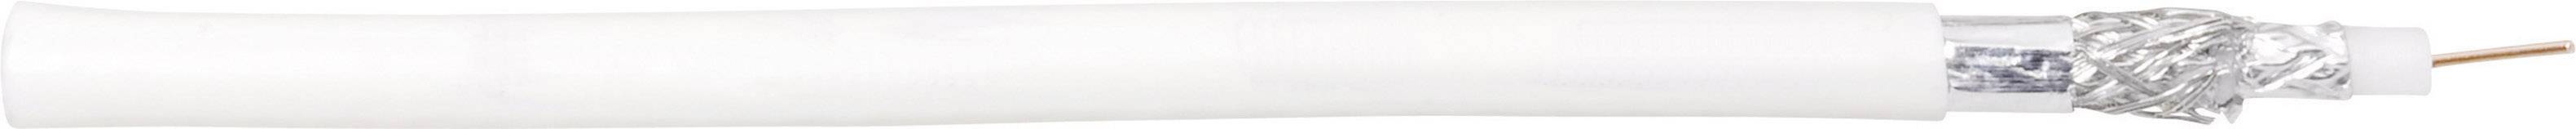 Koaxiální kabel 70I044, 75 Ohm, bílá, 25 m